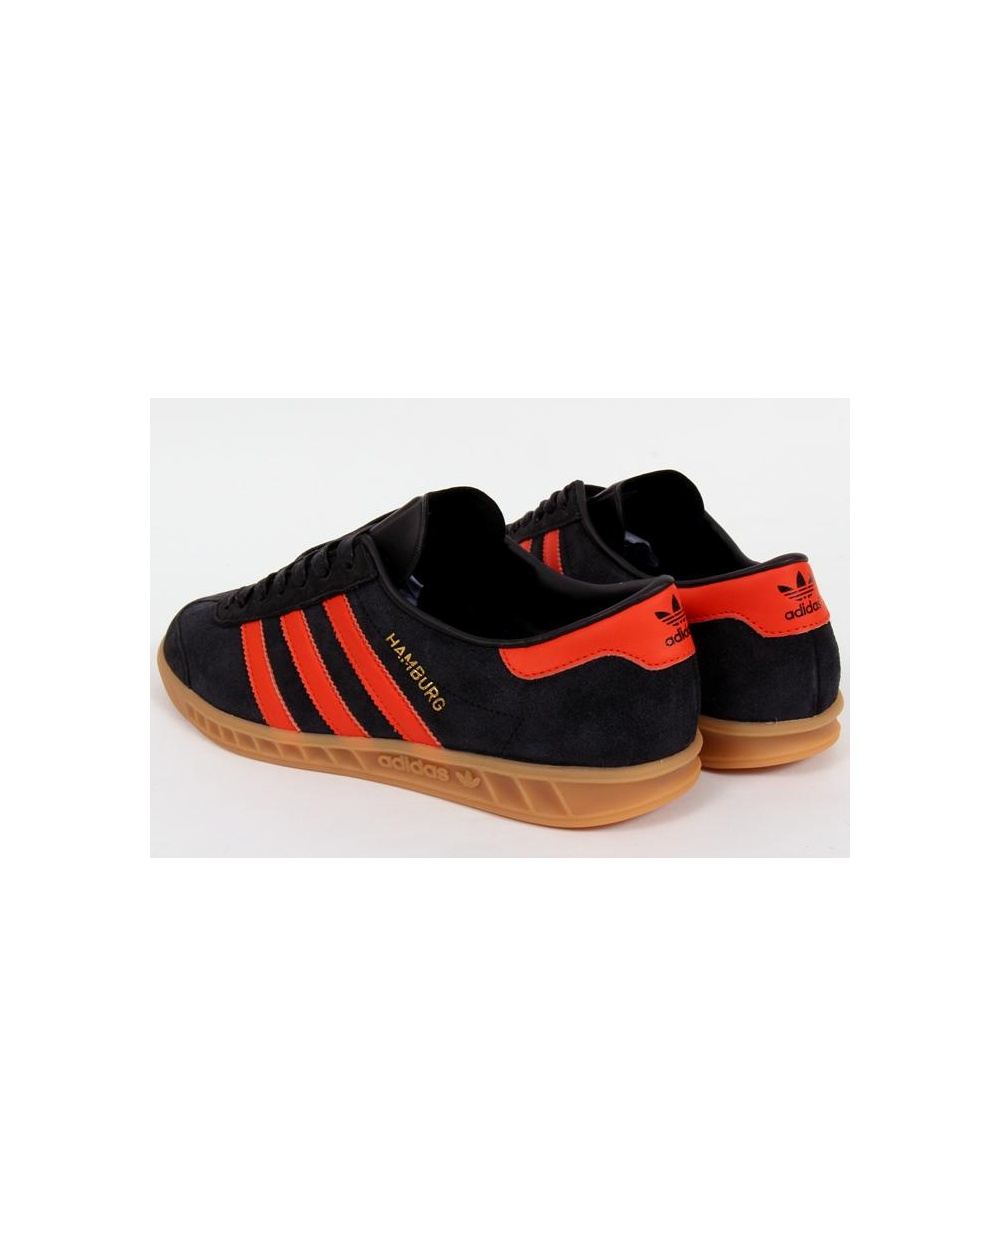 adidas hamburg black and orange